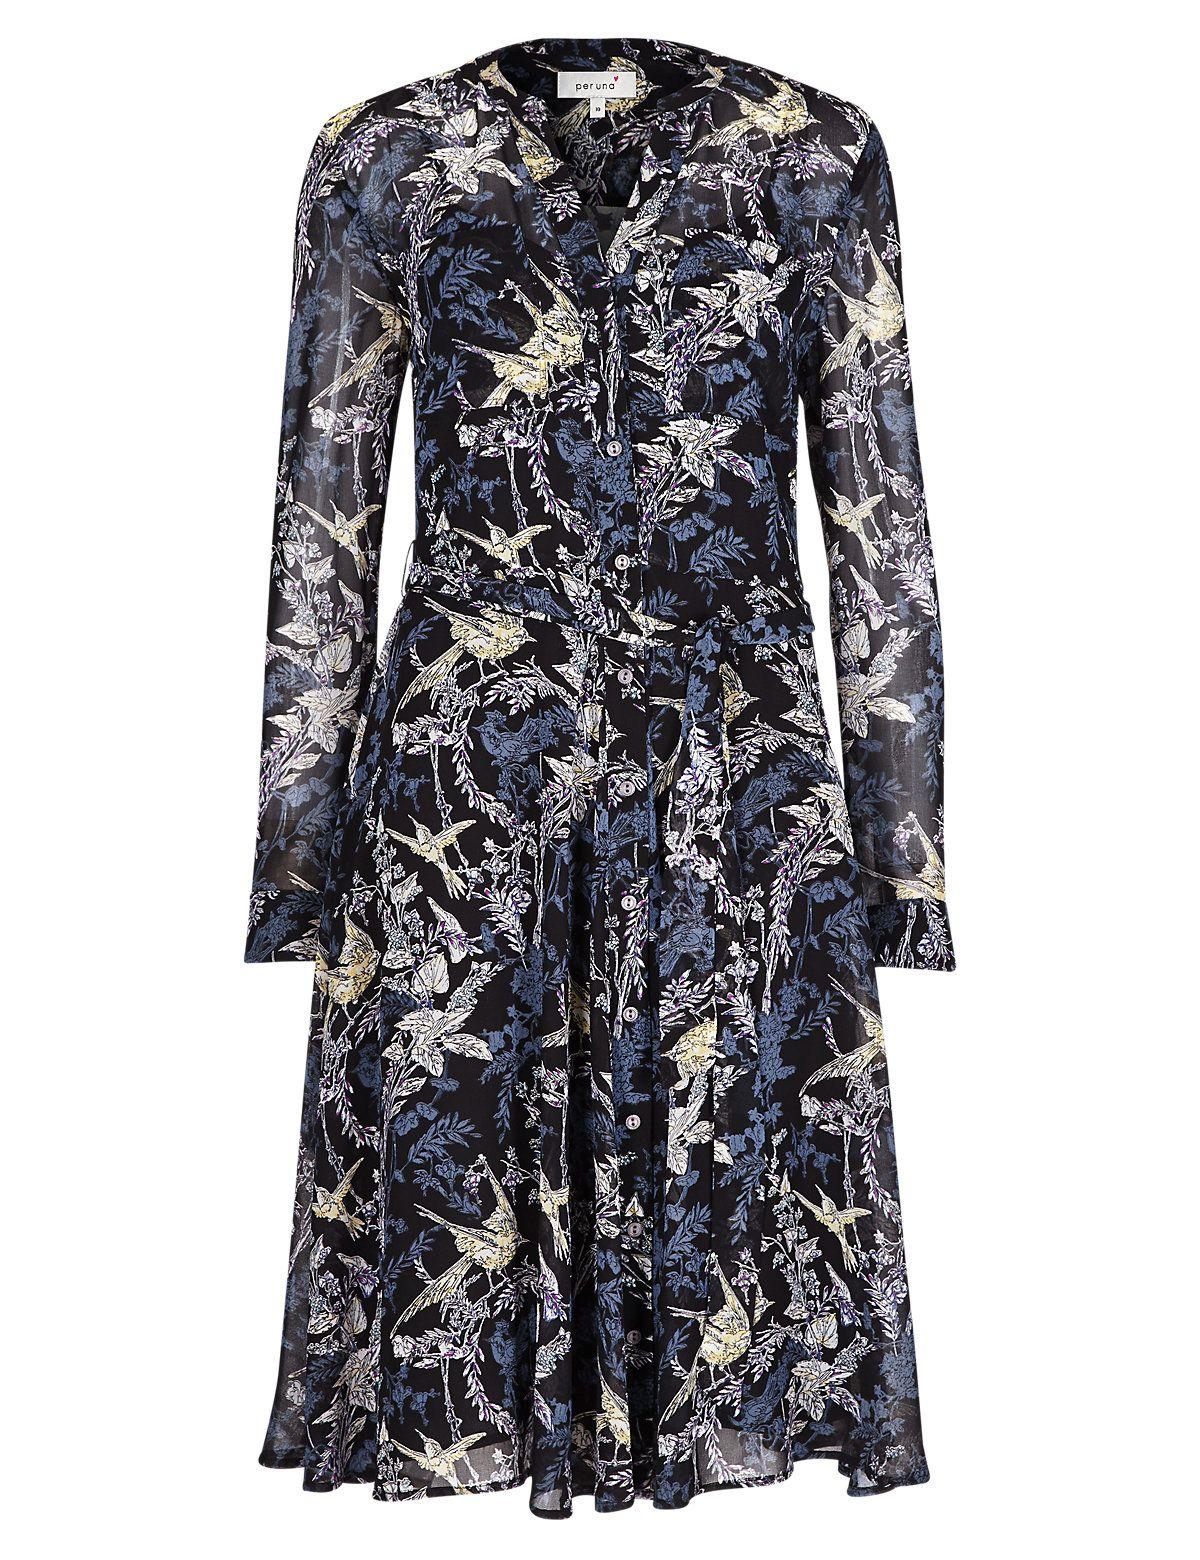 per una navy dress flower with tie waist - Google Search   Dresses ...